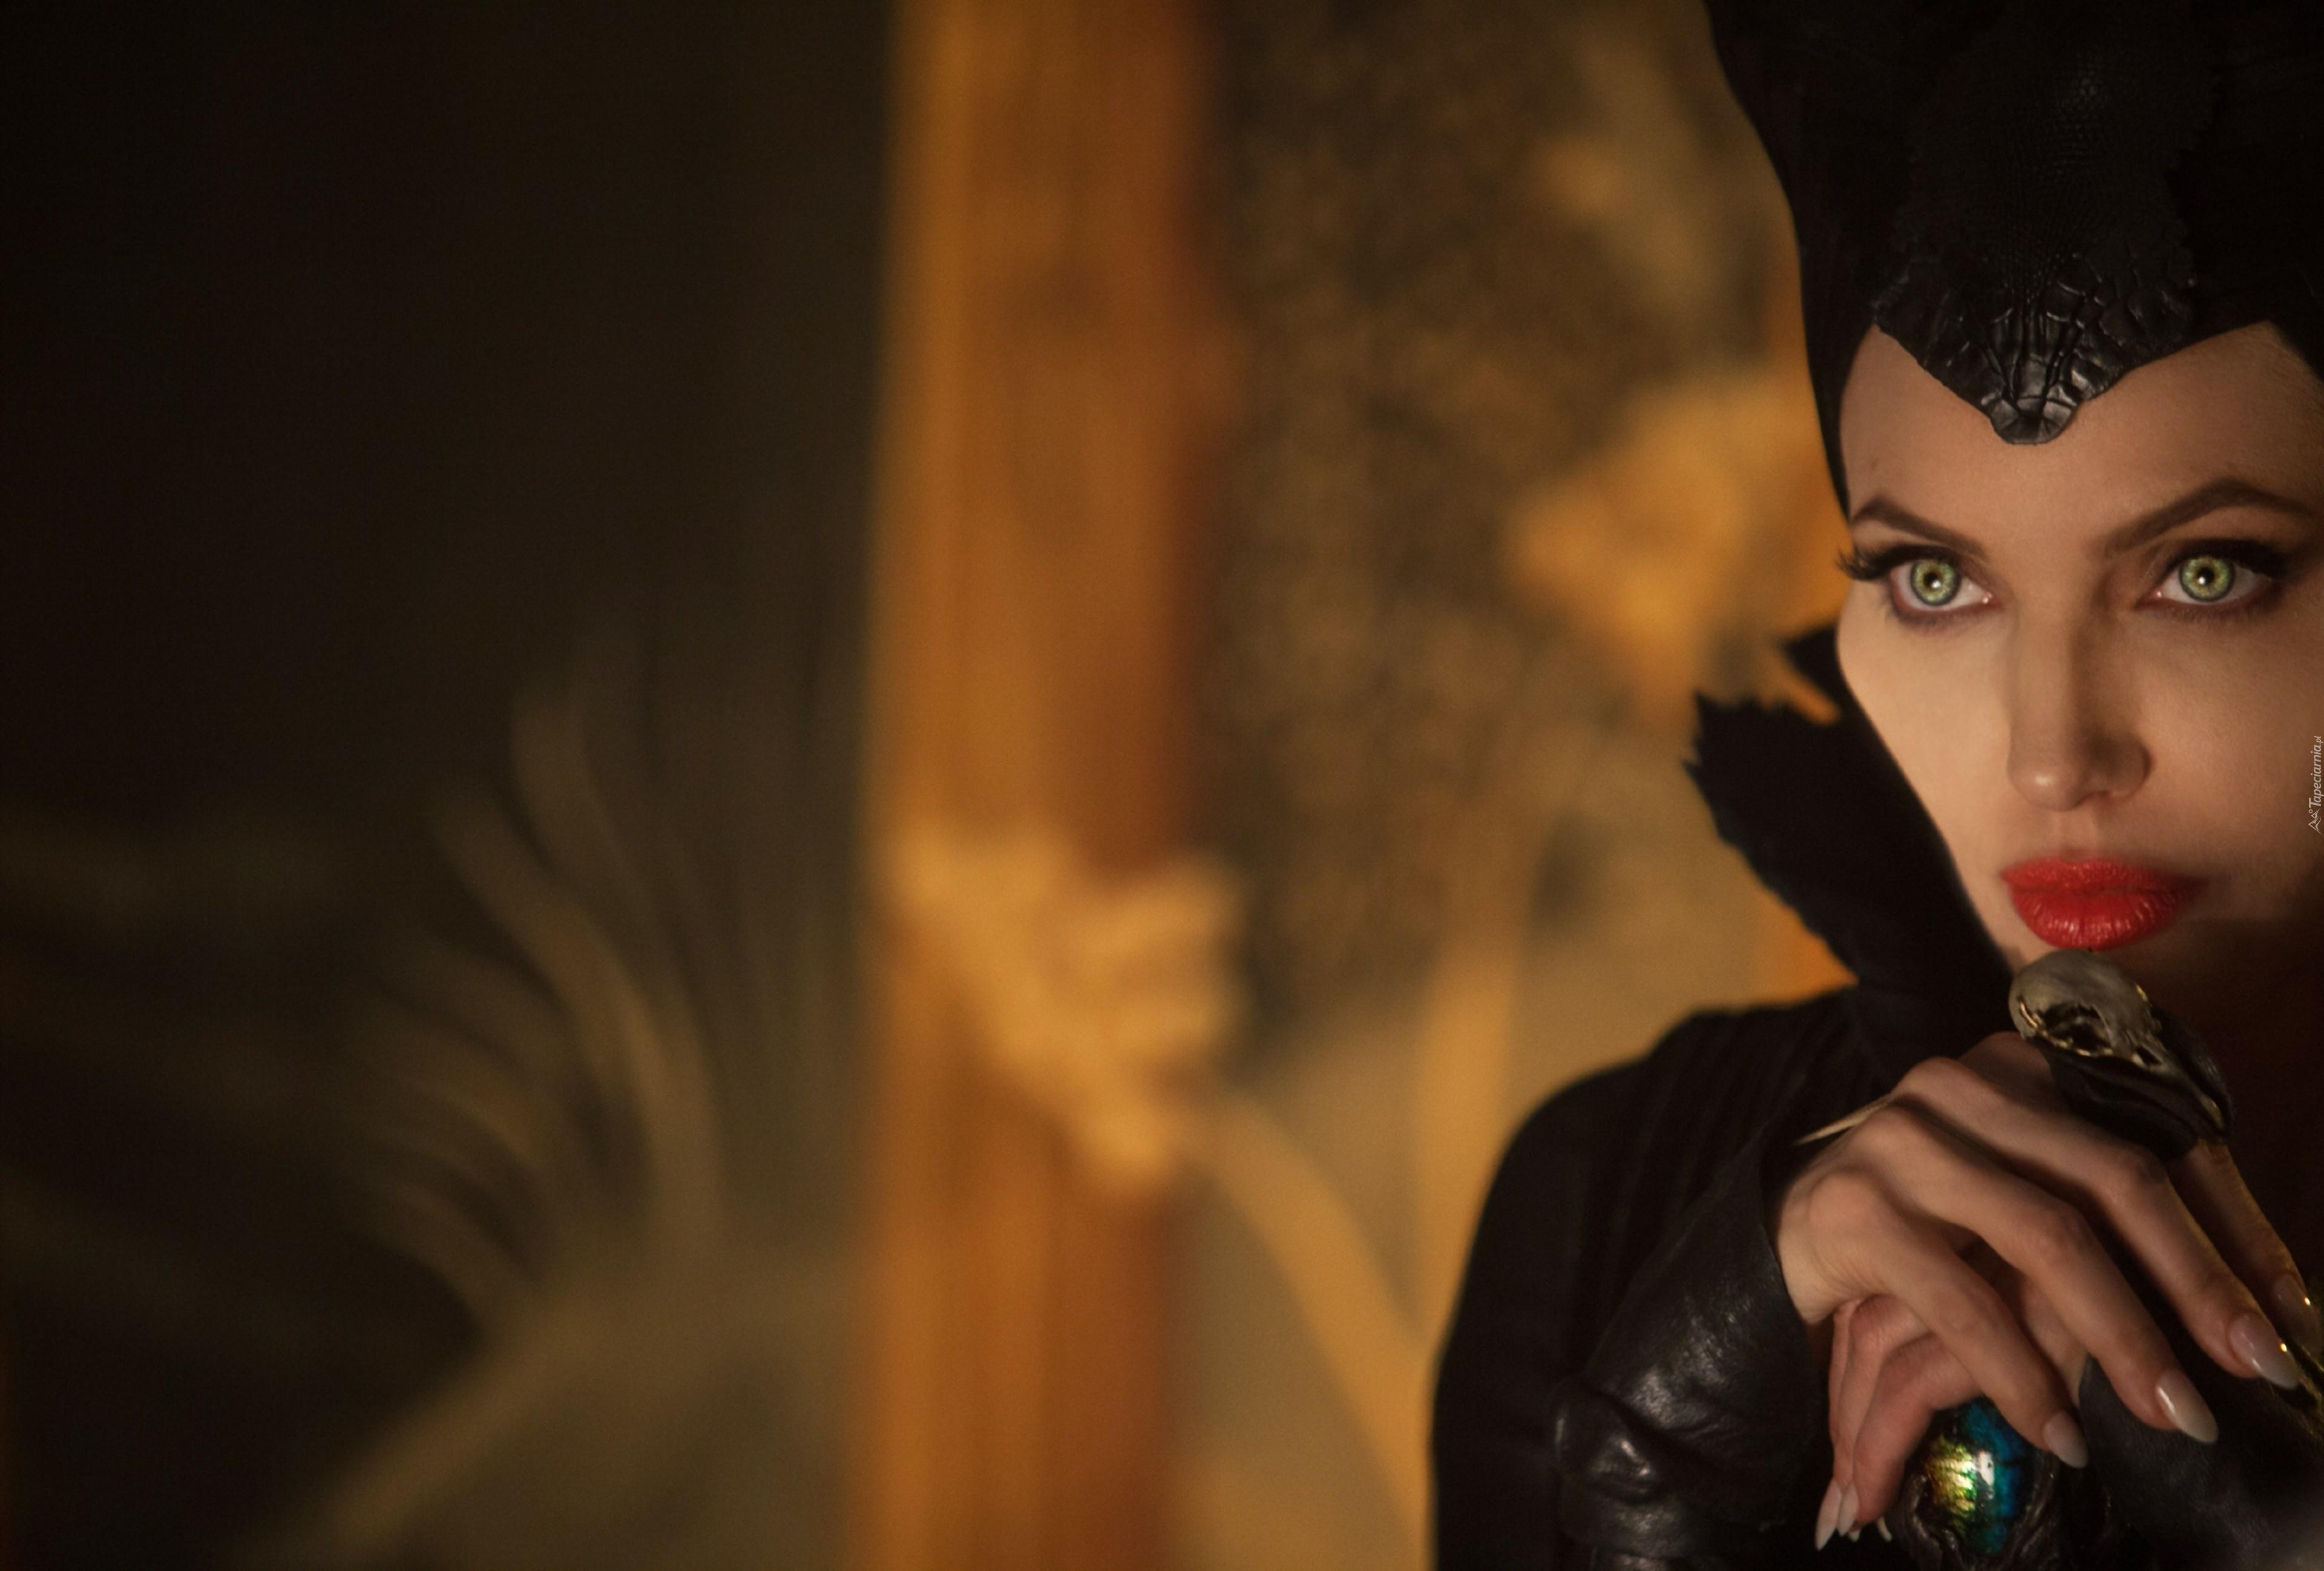 czarownica, angelina jolie